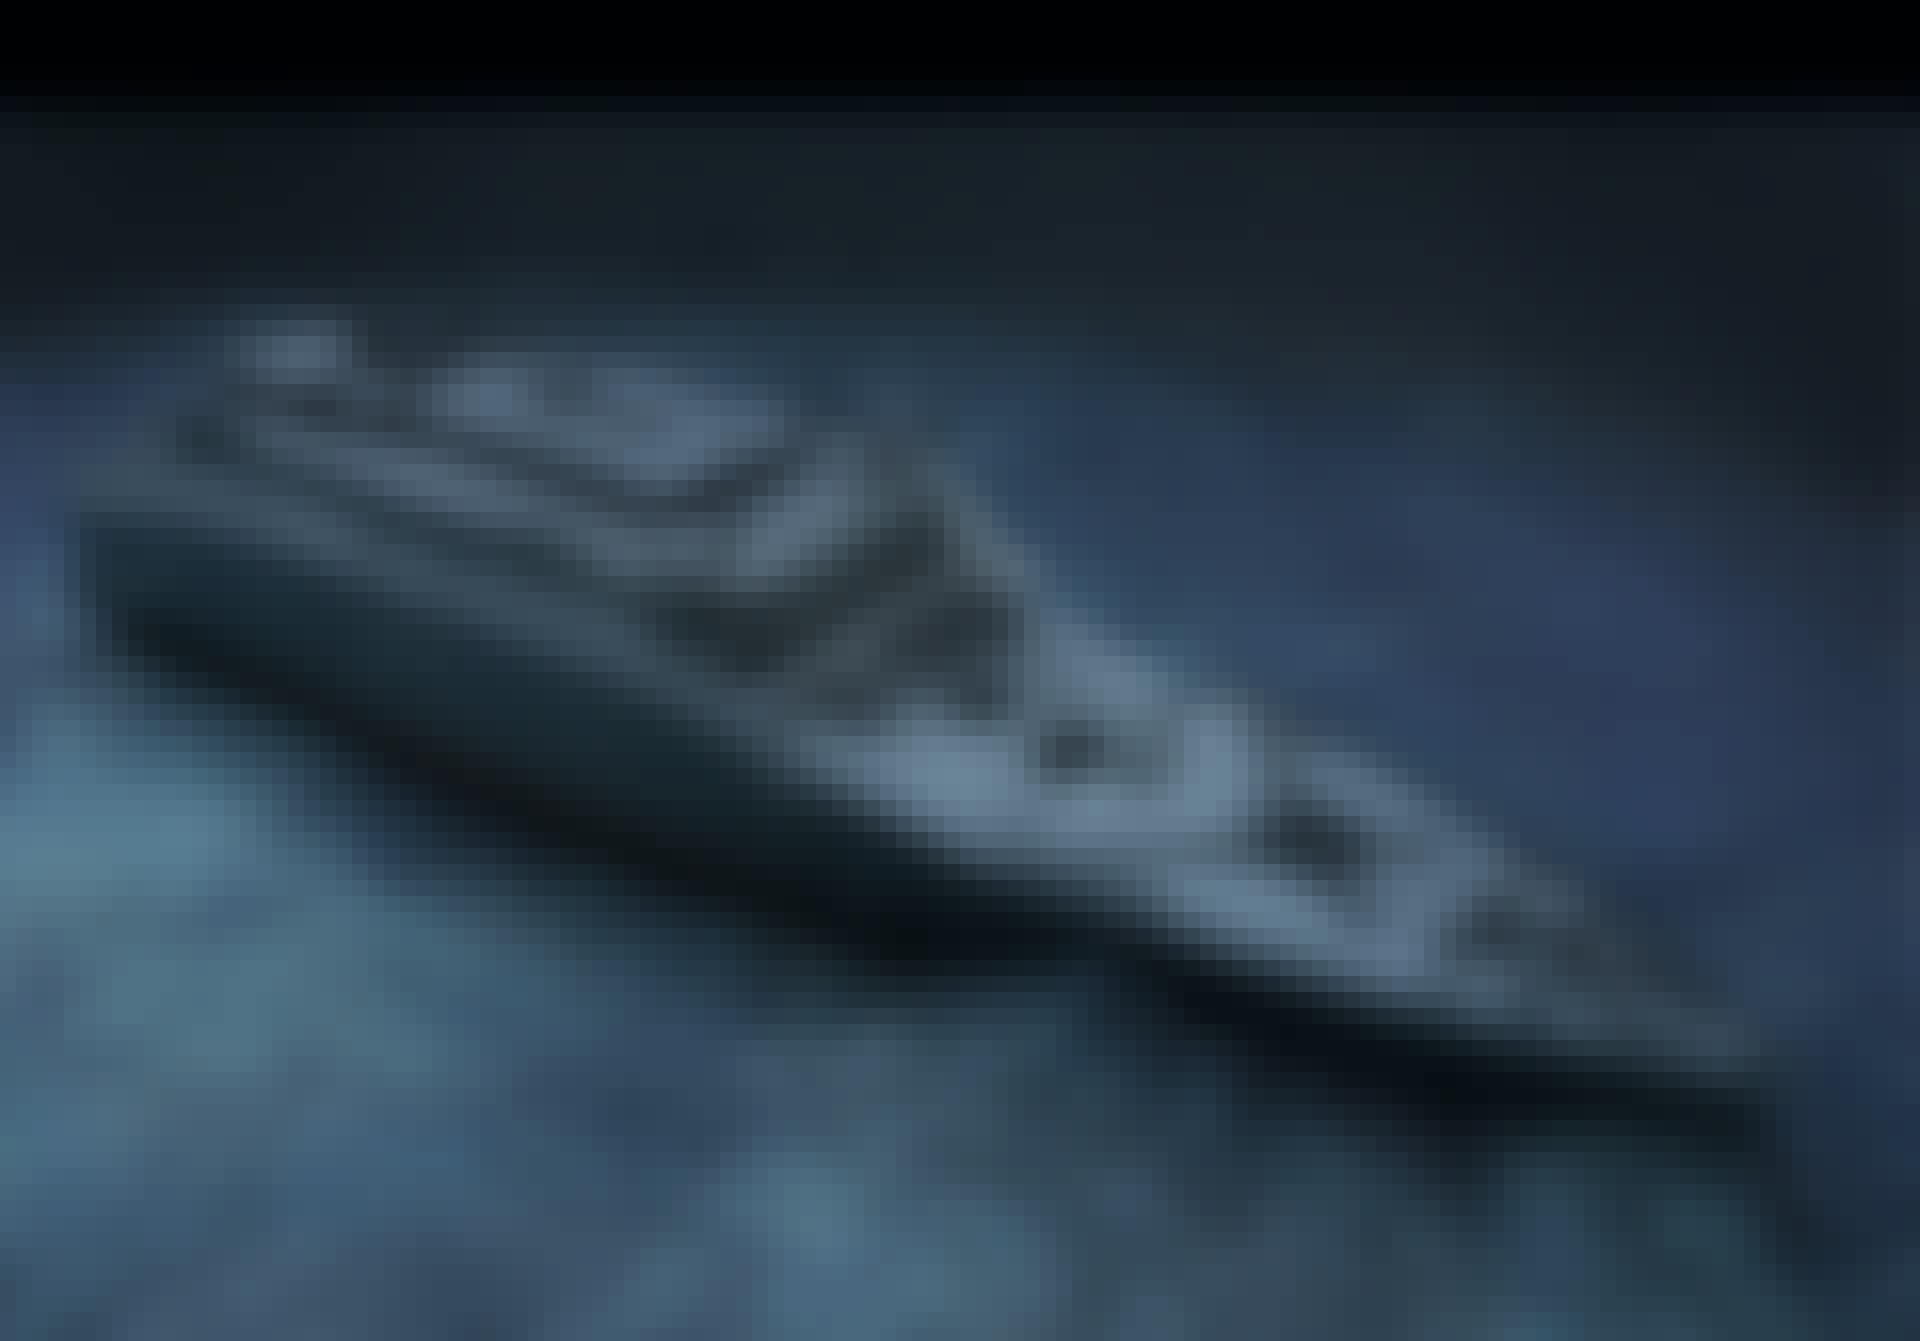 Titanic bjærgning dom